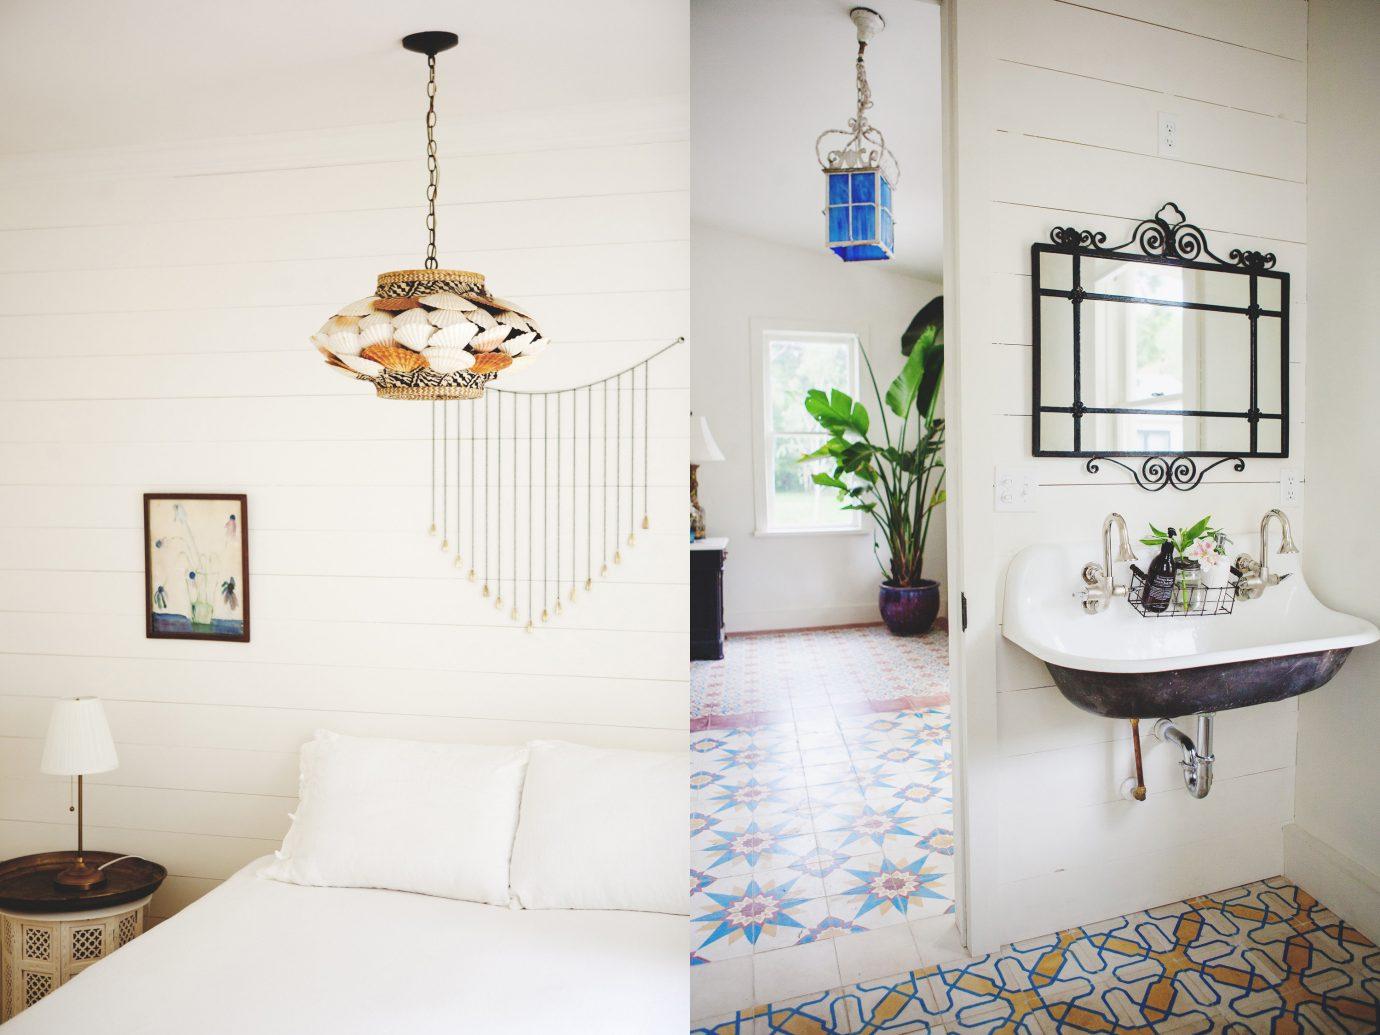 Hotels indoor wall white room interior design lighting home Design living room ceiling furniture